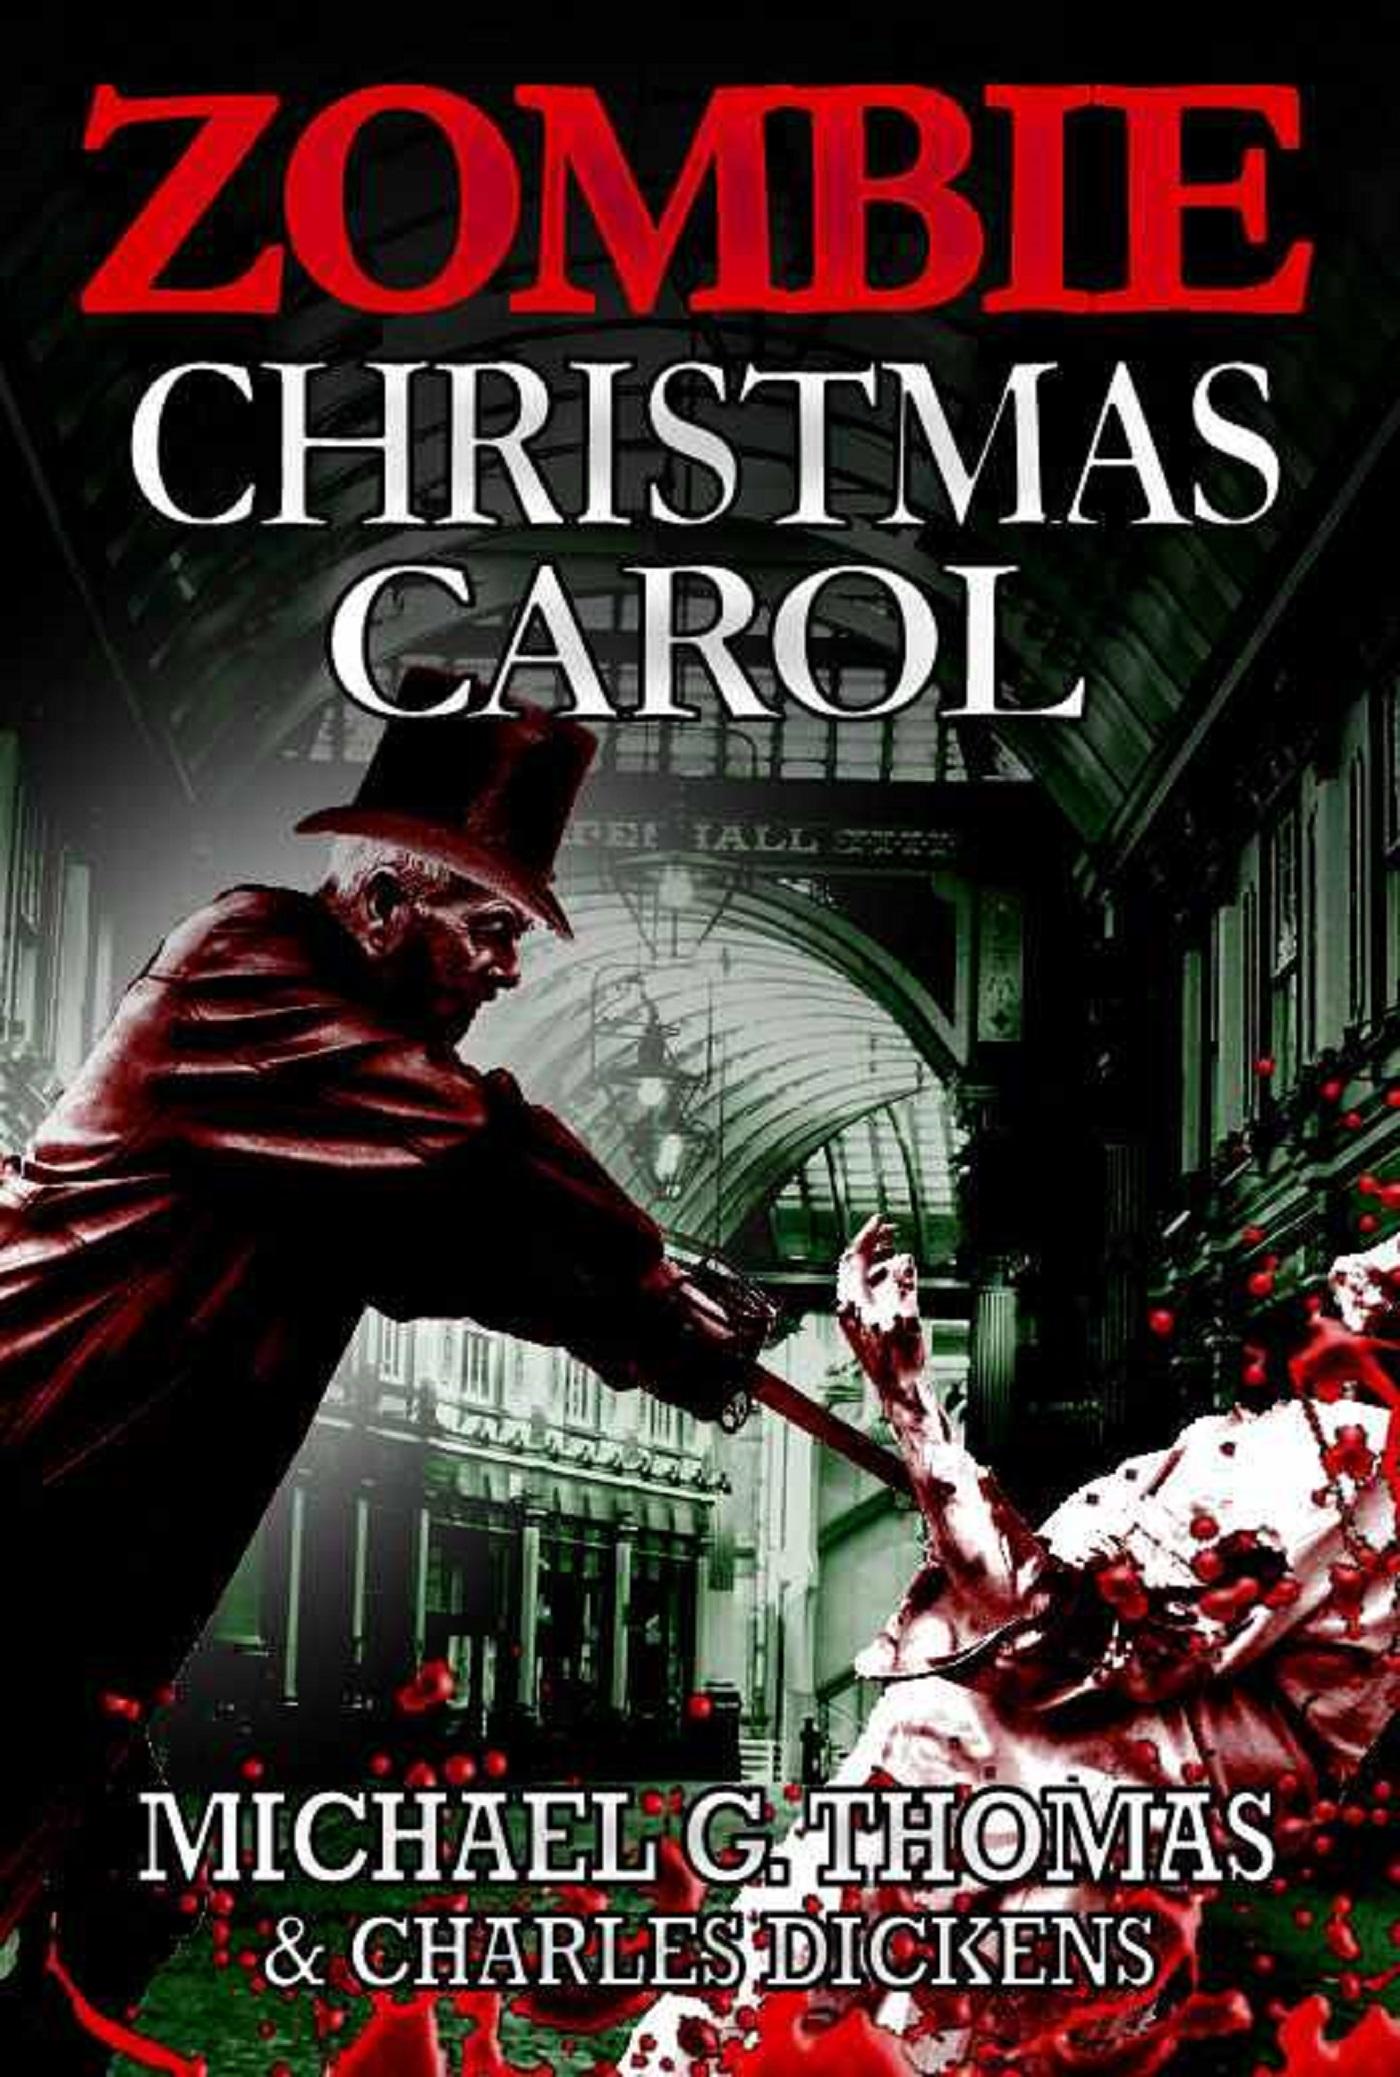 Christmas Carol Book.A Zombie Christmas Carol An Ebook By Michael G Thomas